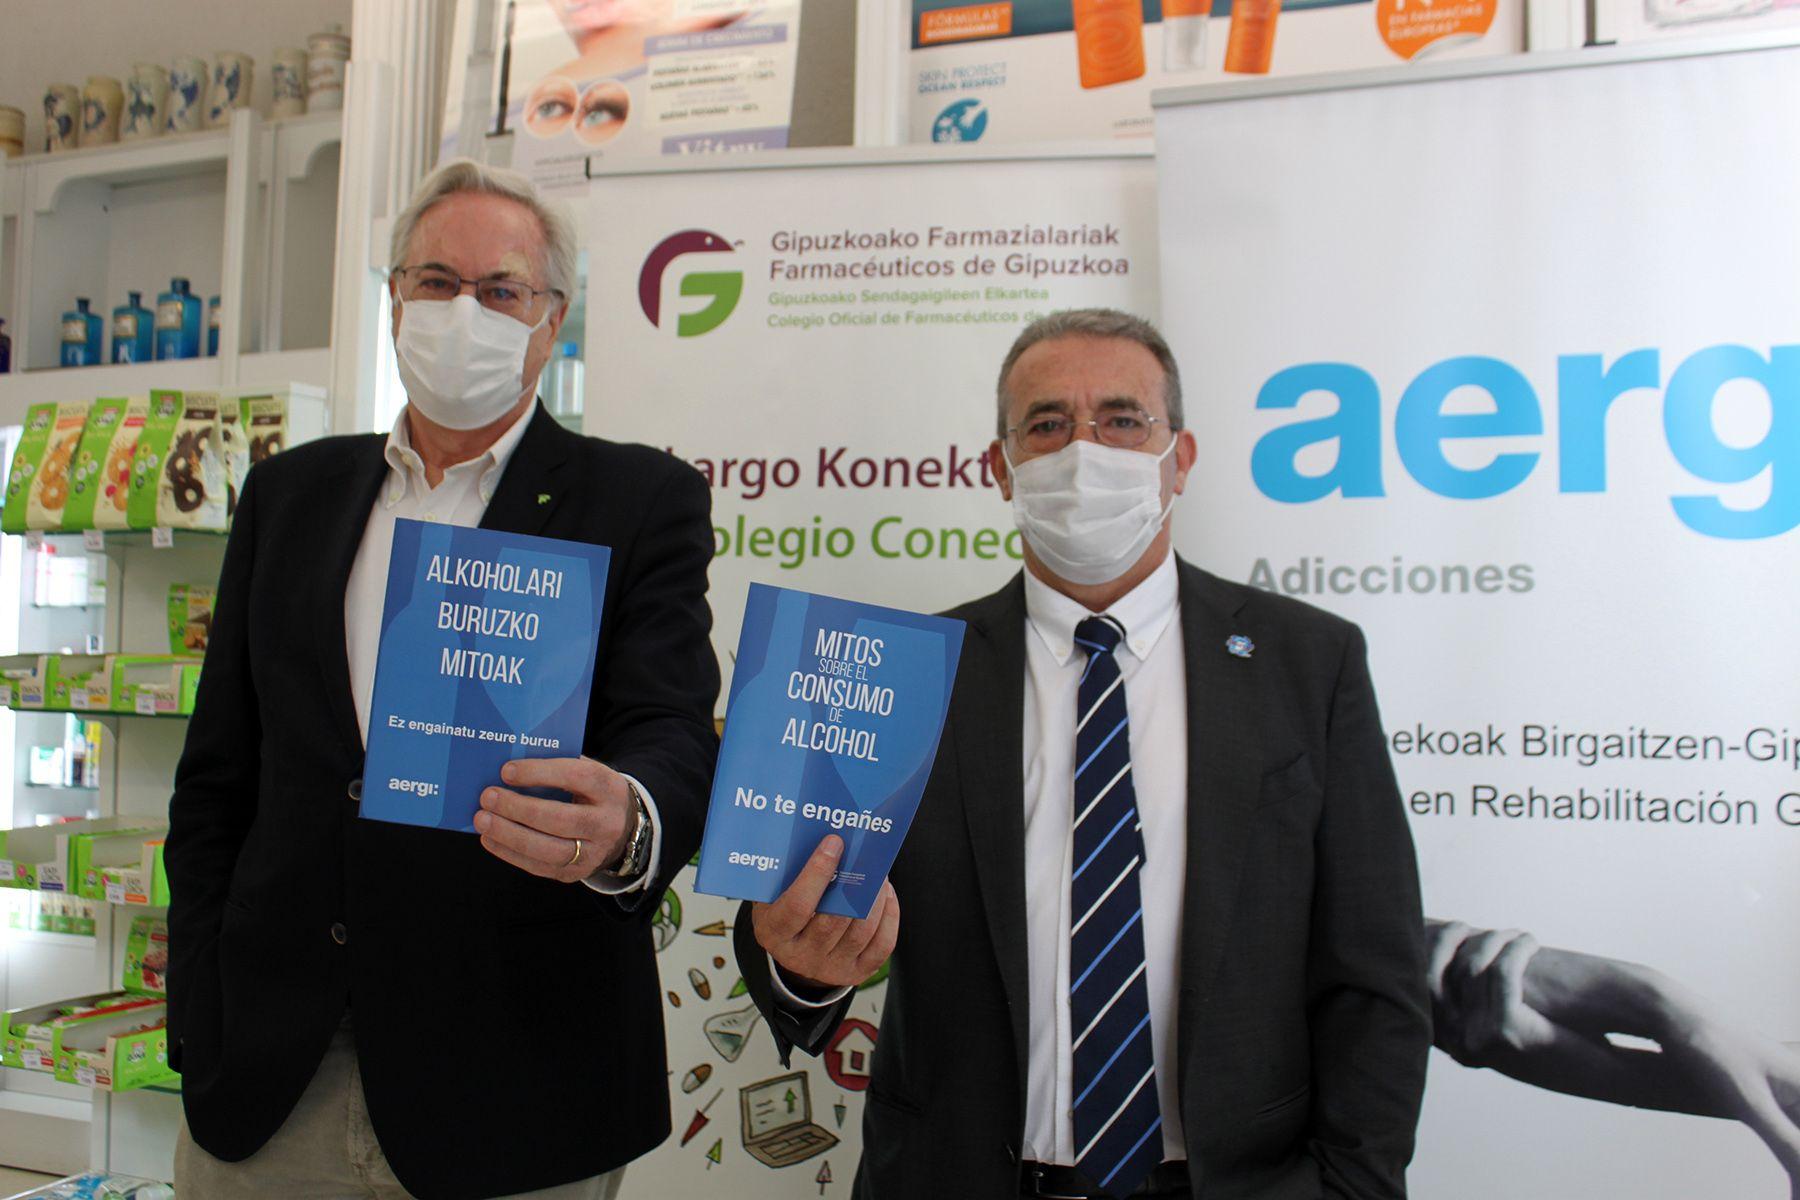 Foto de De izda. a dcha. Miguel Ángel Gastelurrutia, presidente del